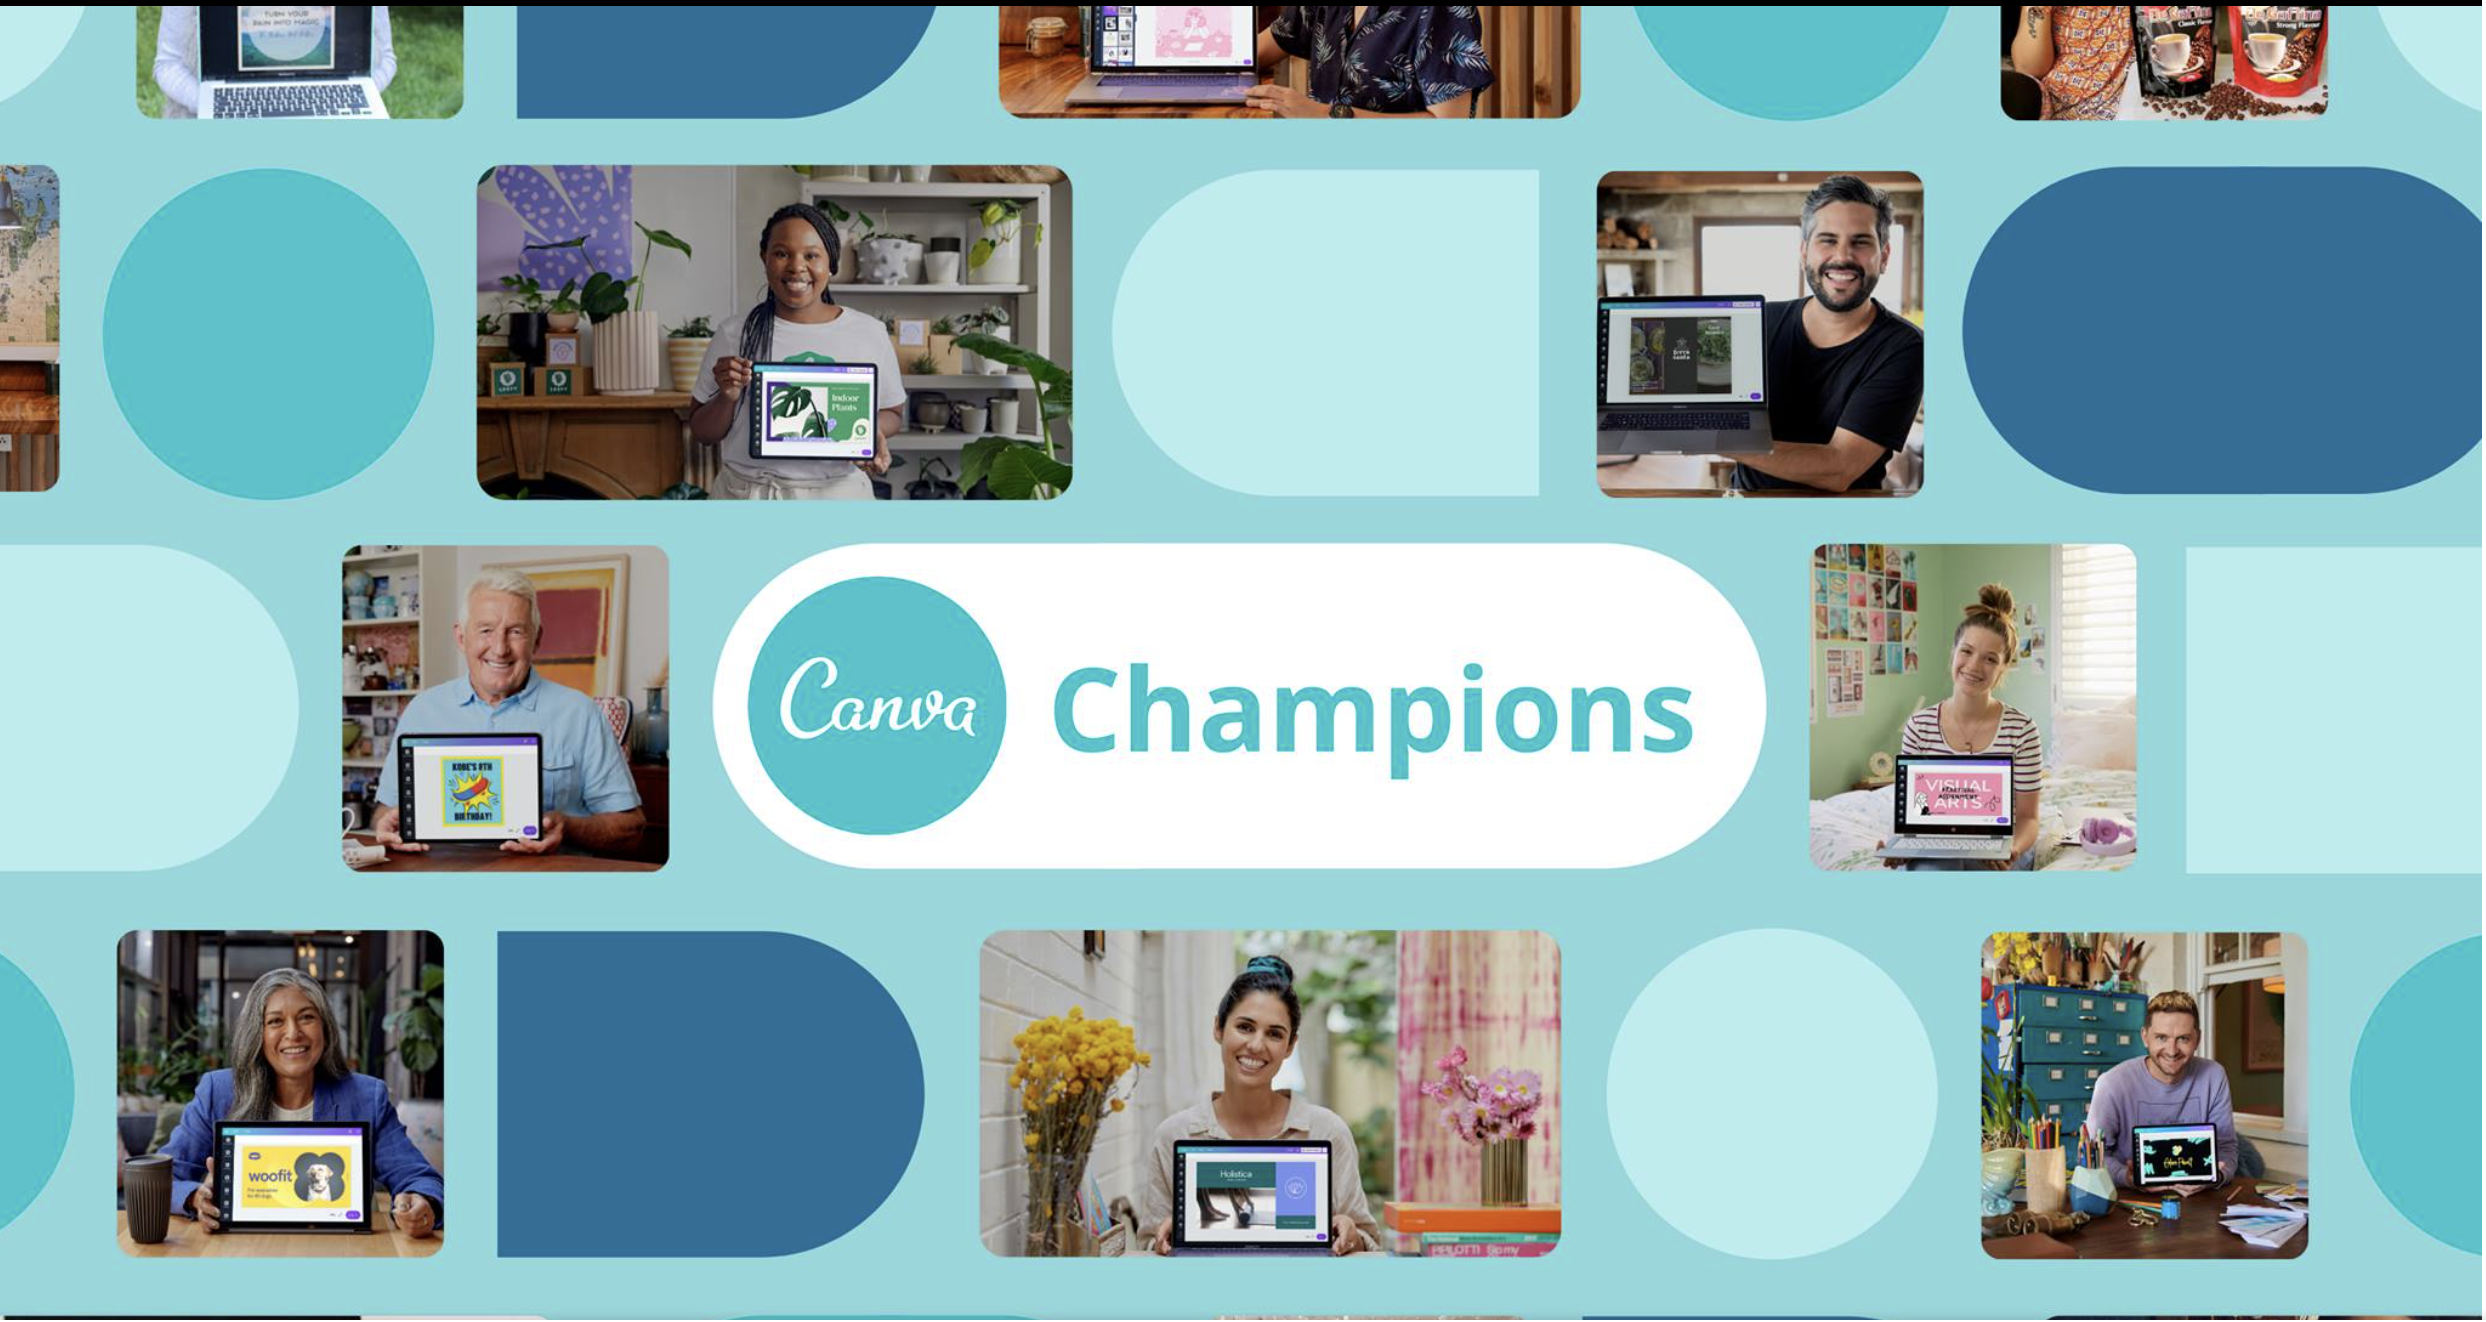 Canva Champions - for Canva Affiliates